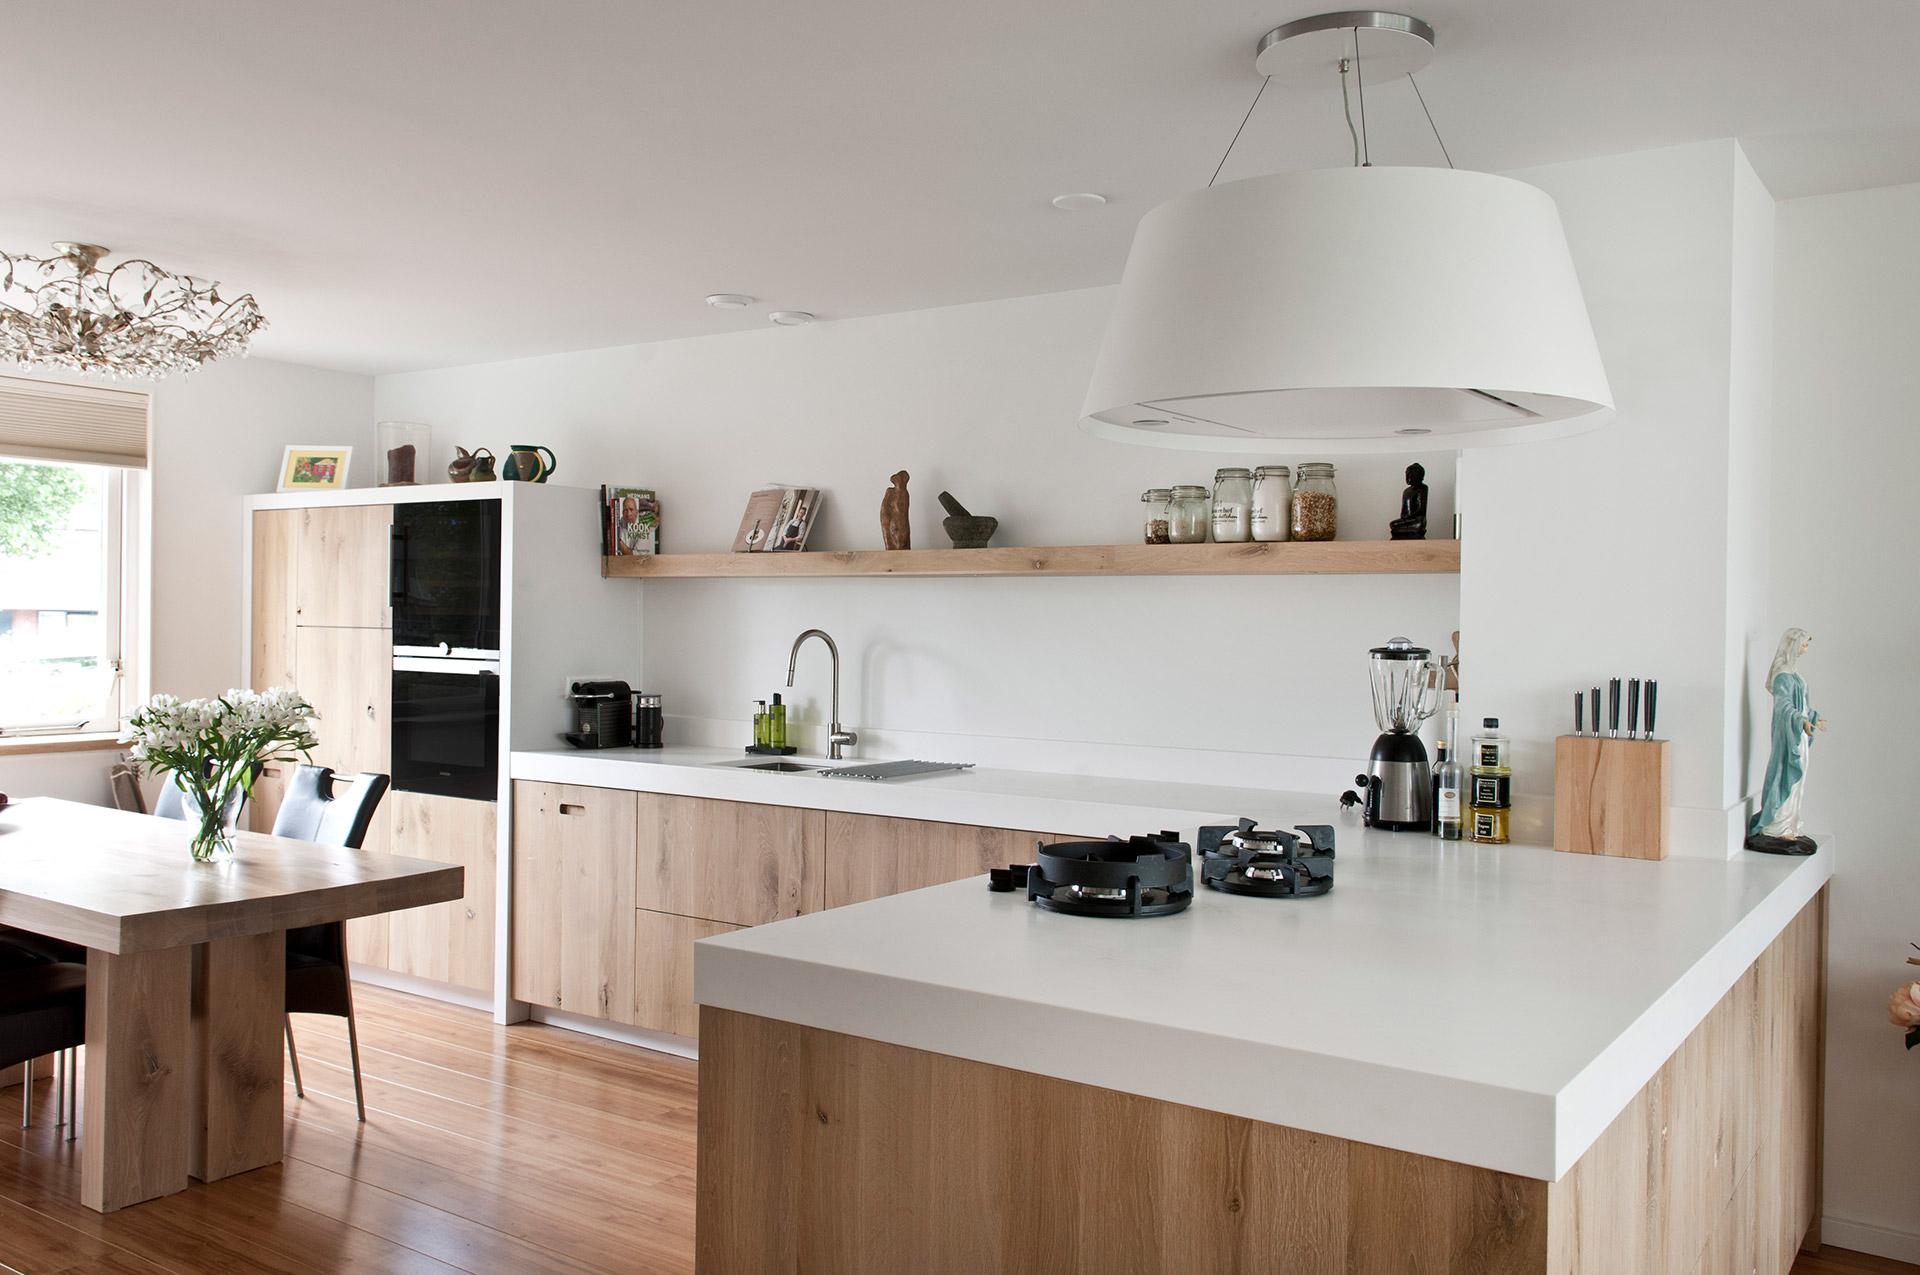 Mooie moderne keukens ~ beste ideen over huis en interieur